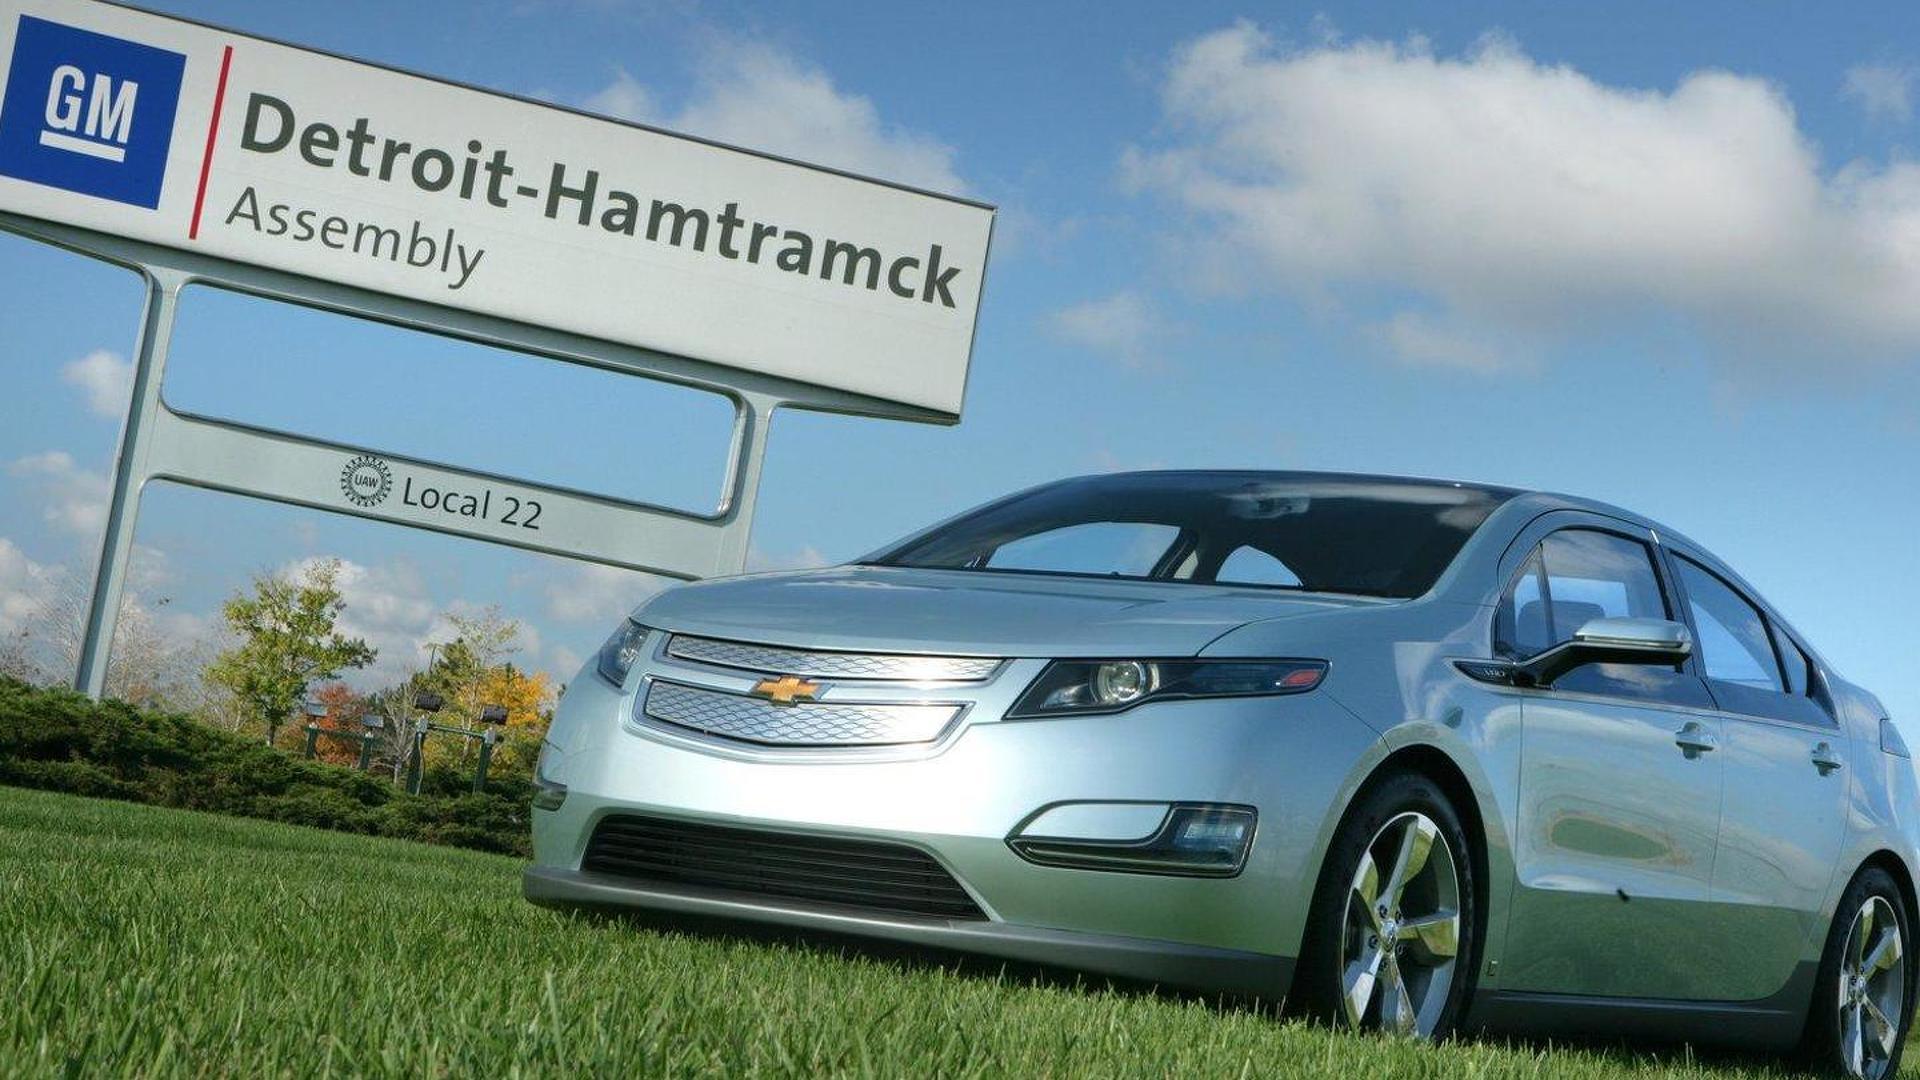 Dealer gouging puts Chevy Volt price above $60,000